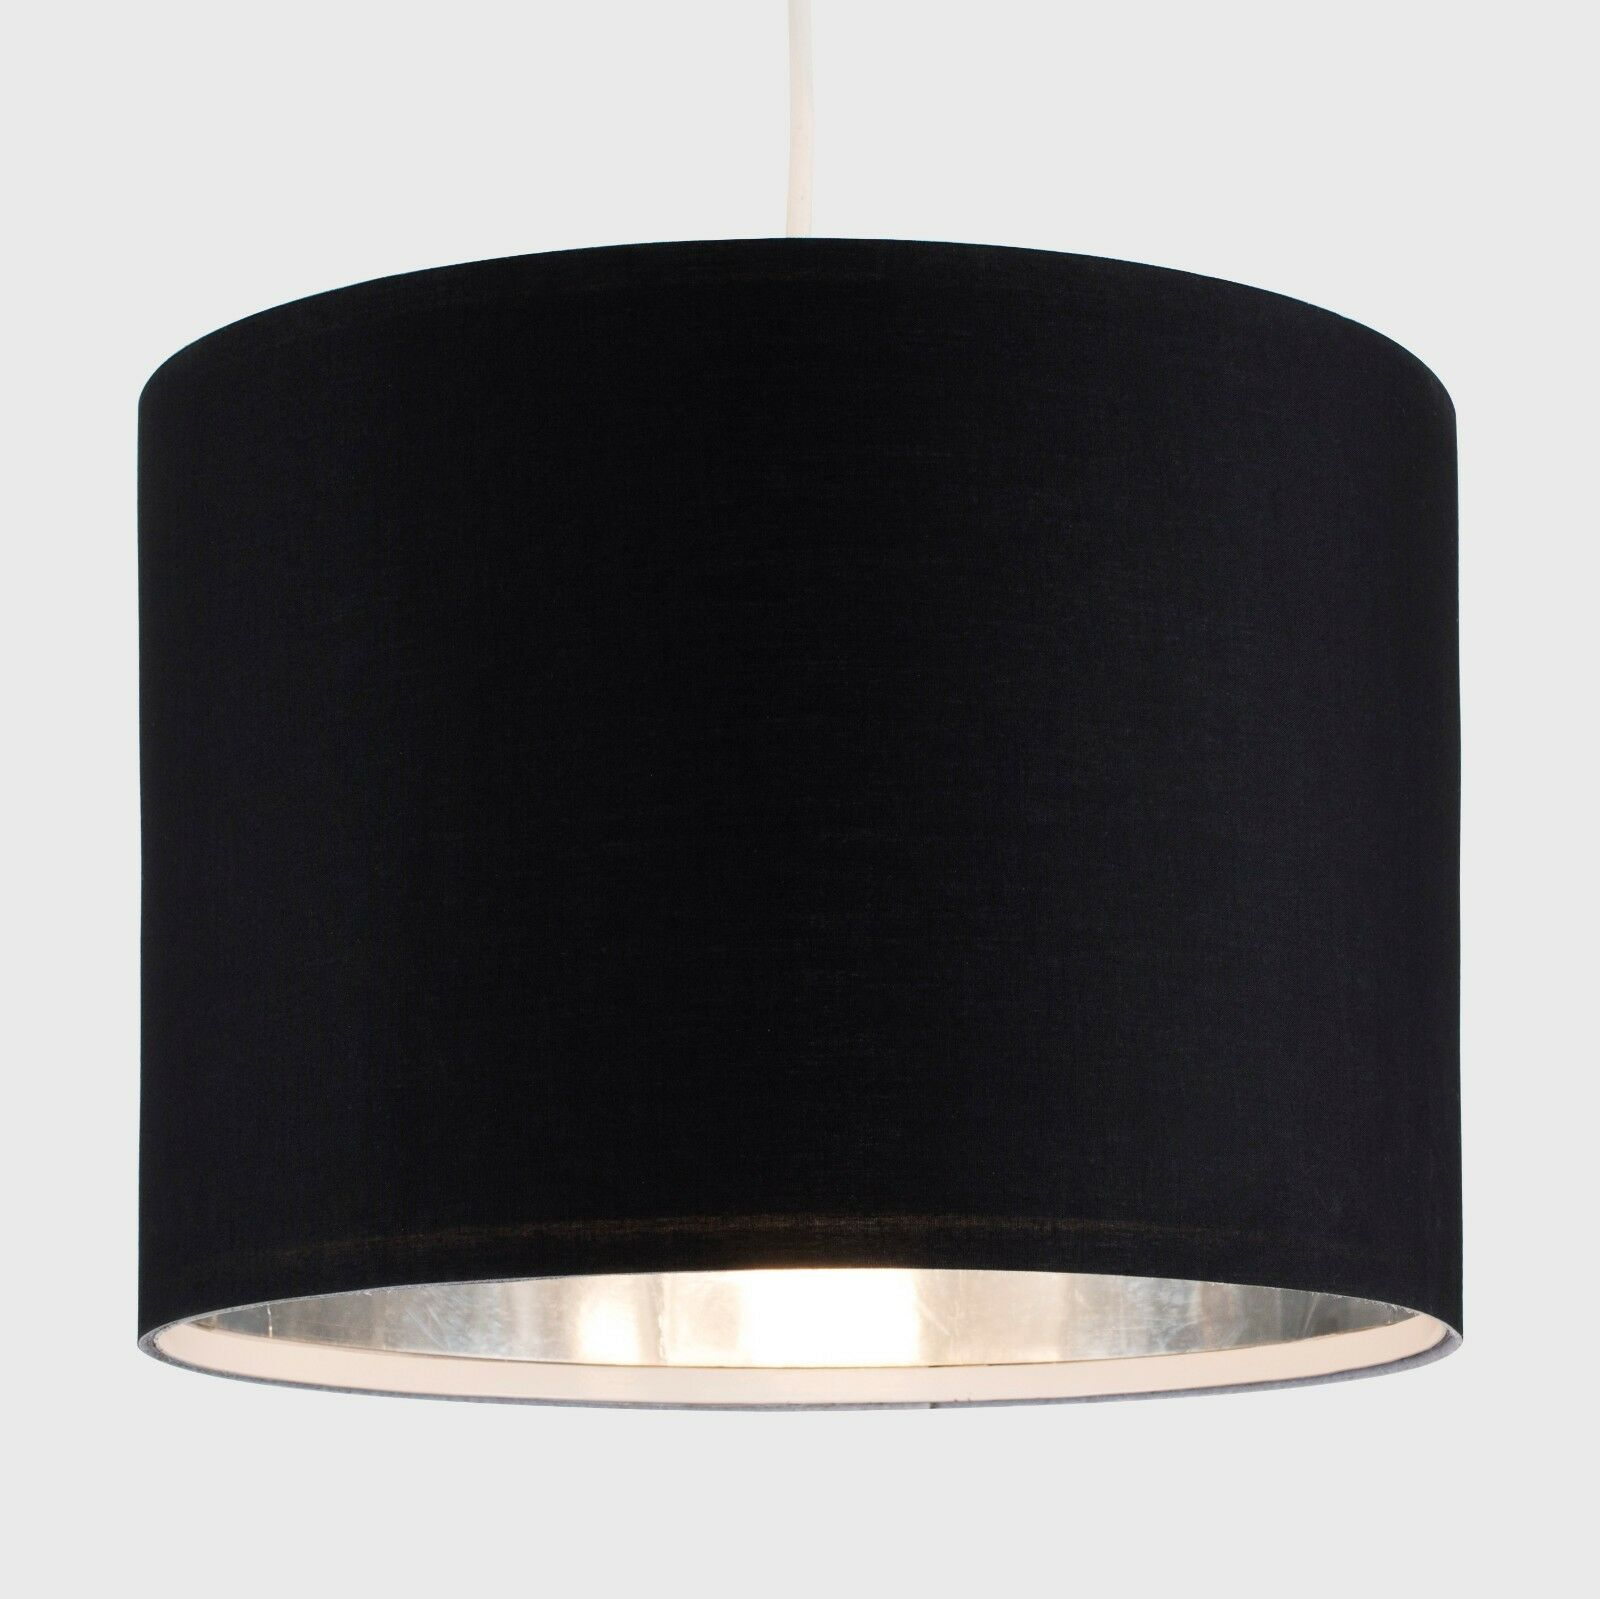 Tela-moderna-algodon-facil-ajuste-Techo-Colgante-Pantalla-De-Mesa-tonos-de-luz-de-tambor miniatura 24